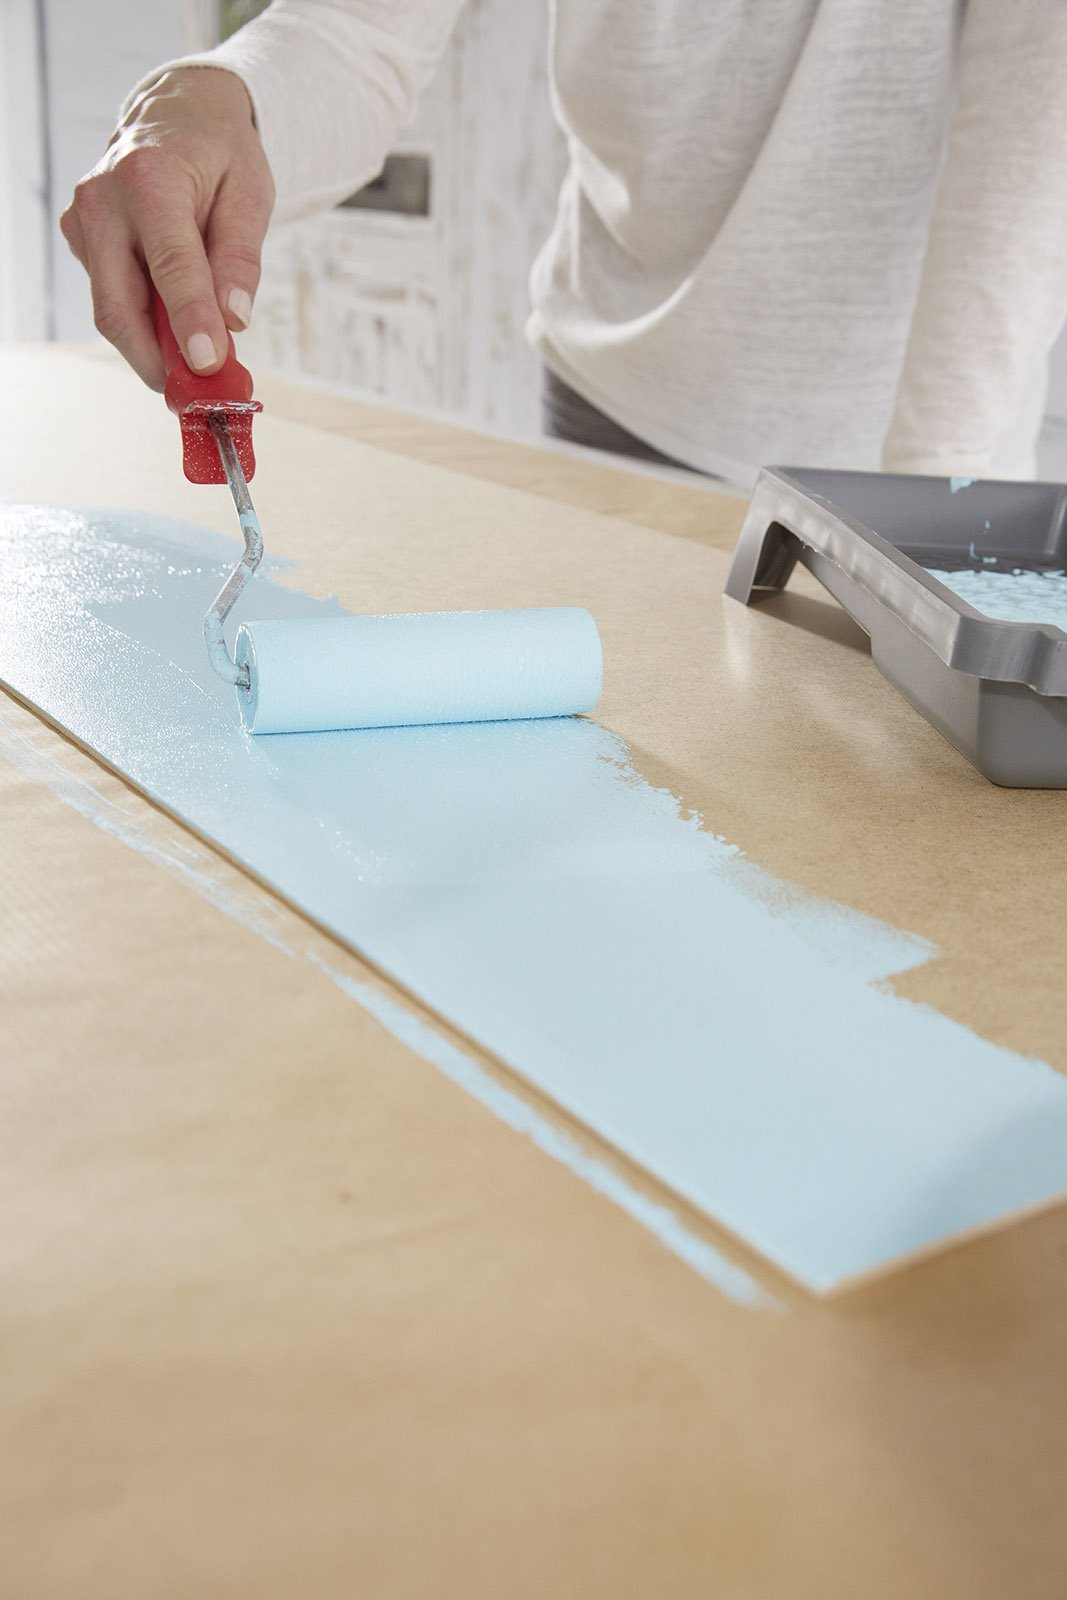 Carta Adesiva Per Mobili Ikea: Rivestimenti cucina - ikea. Astenersi ...